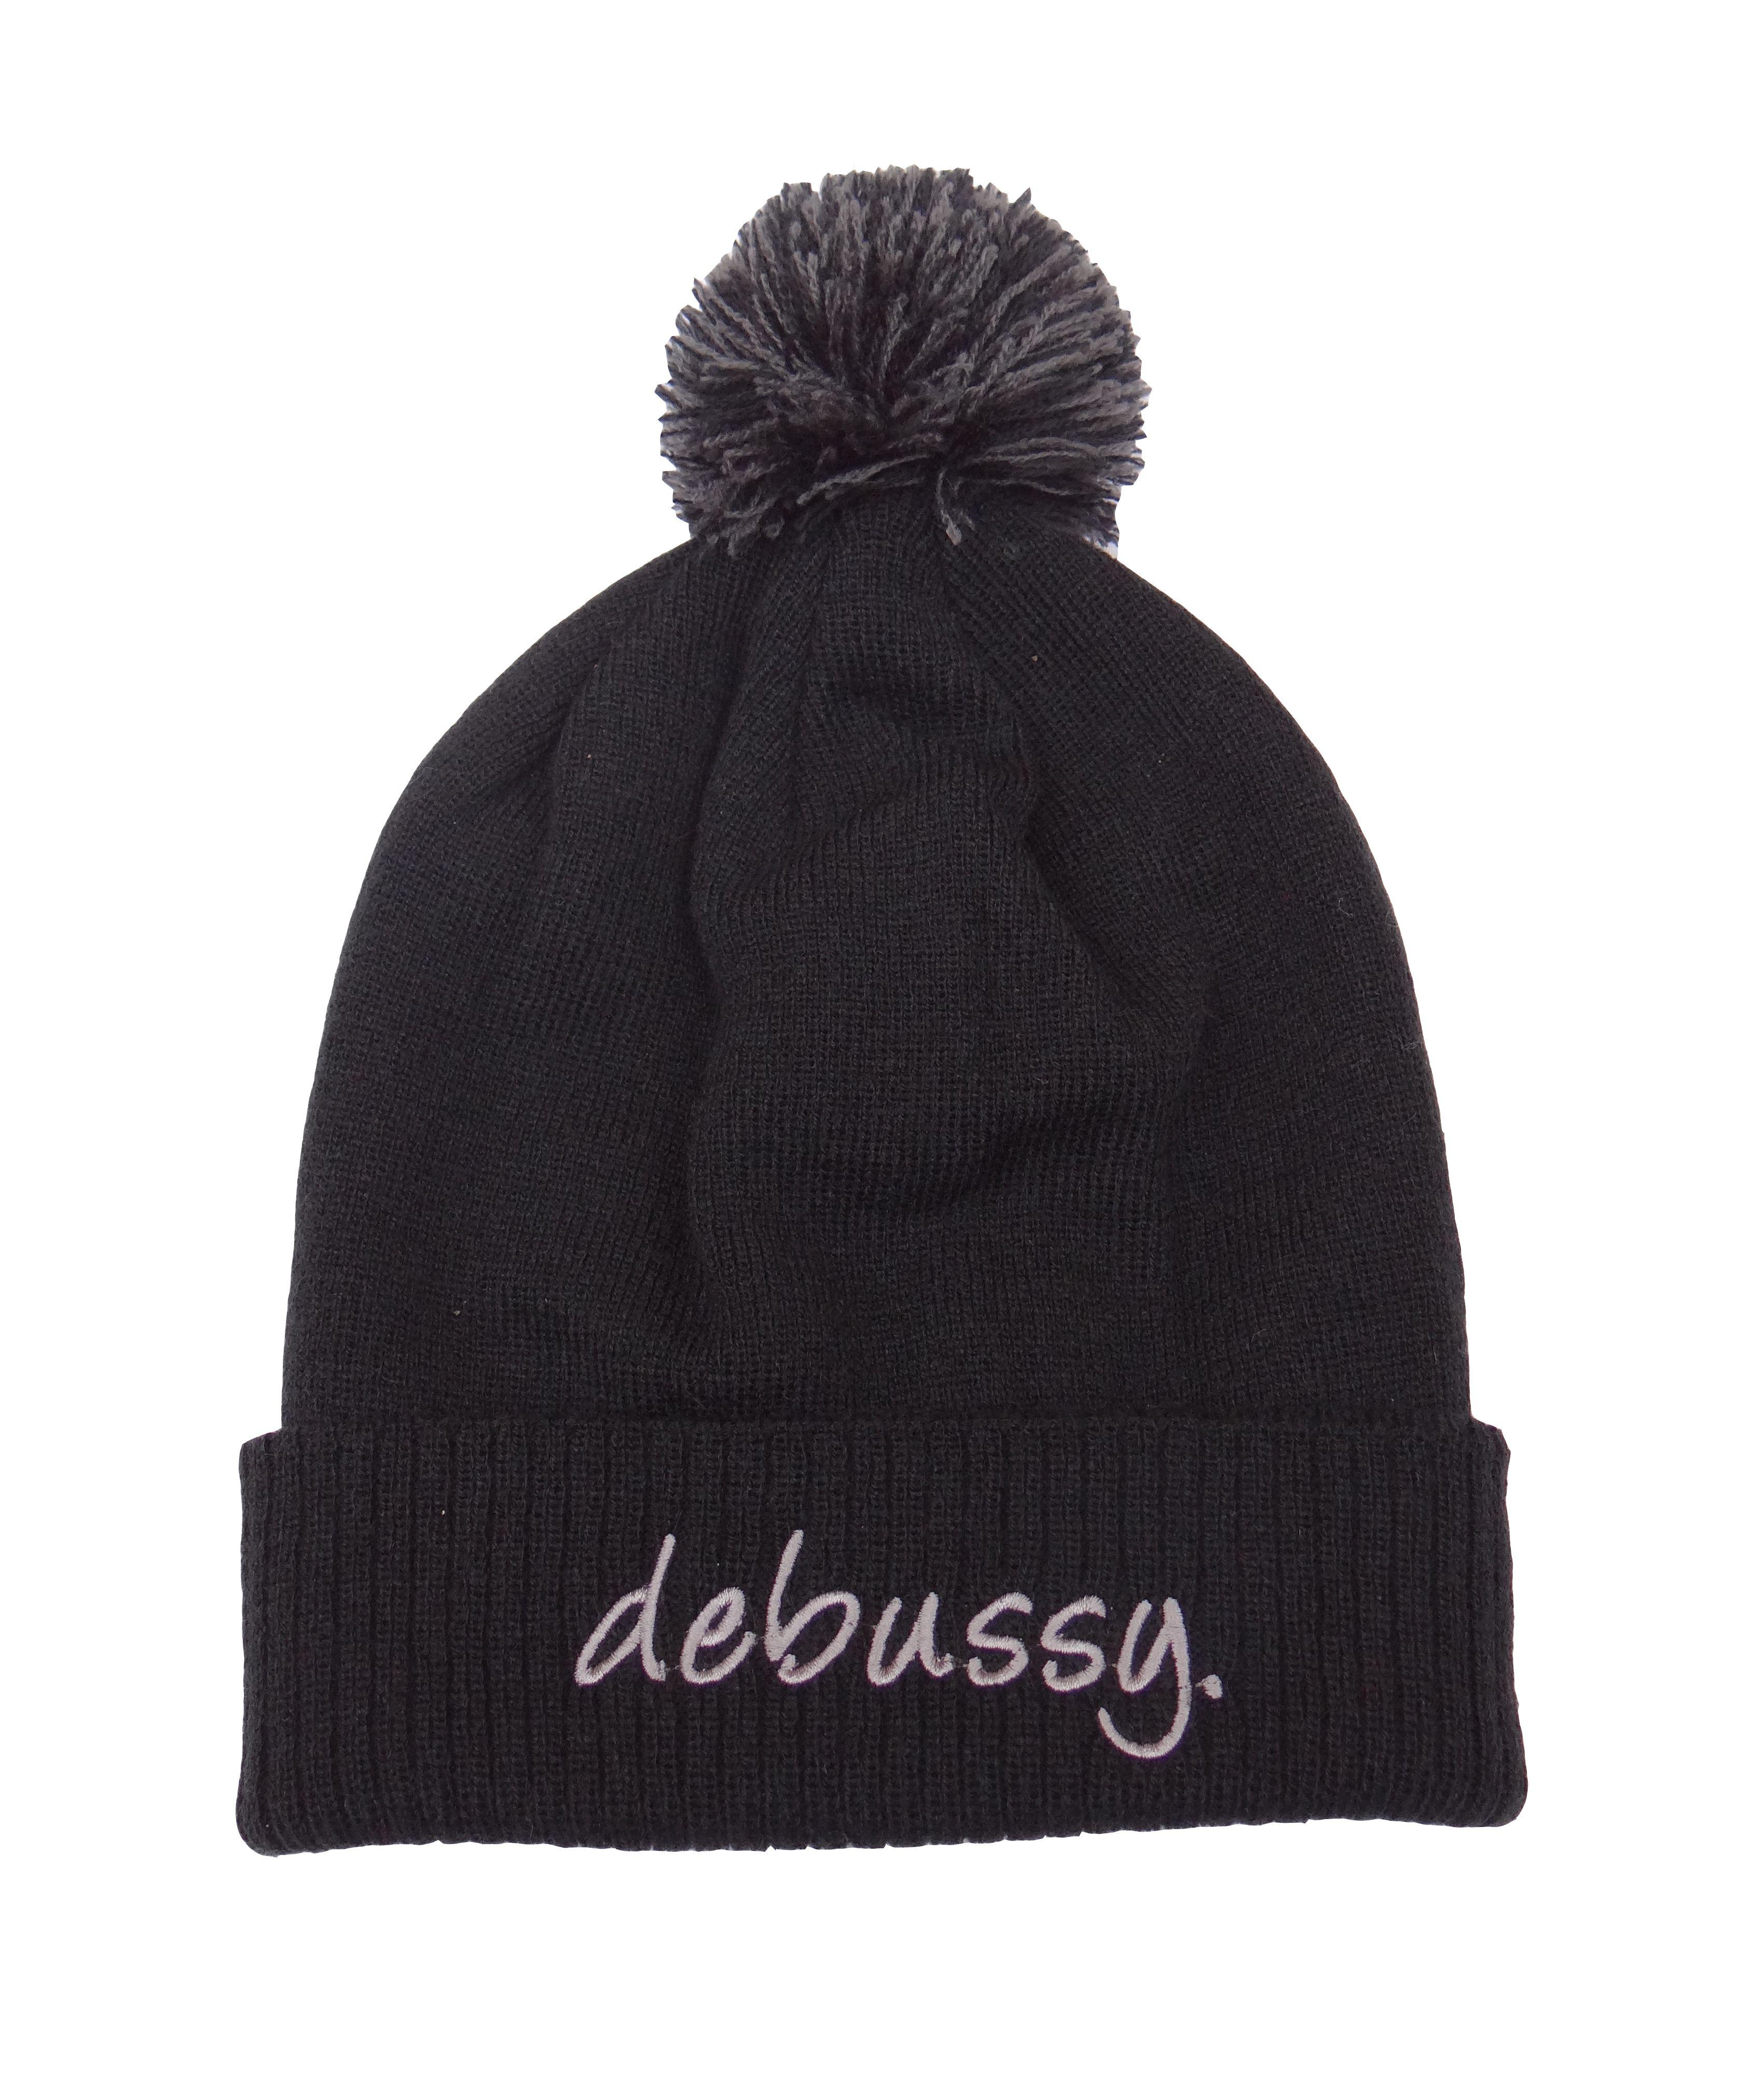 DEBUSSY CLASSIC BLACK & GRAPHITE BEANIE HAT